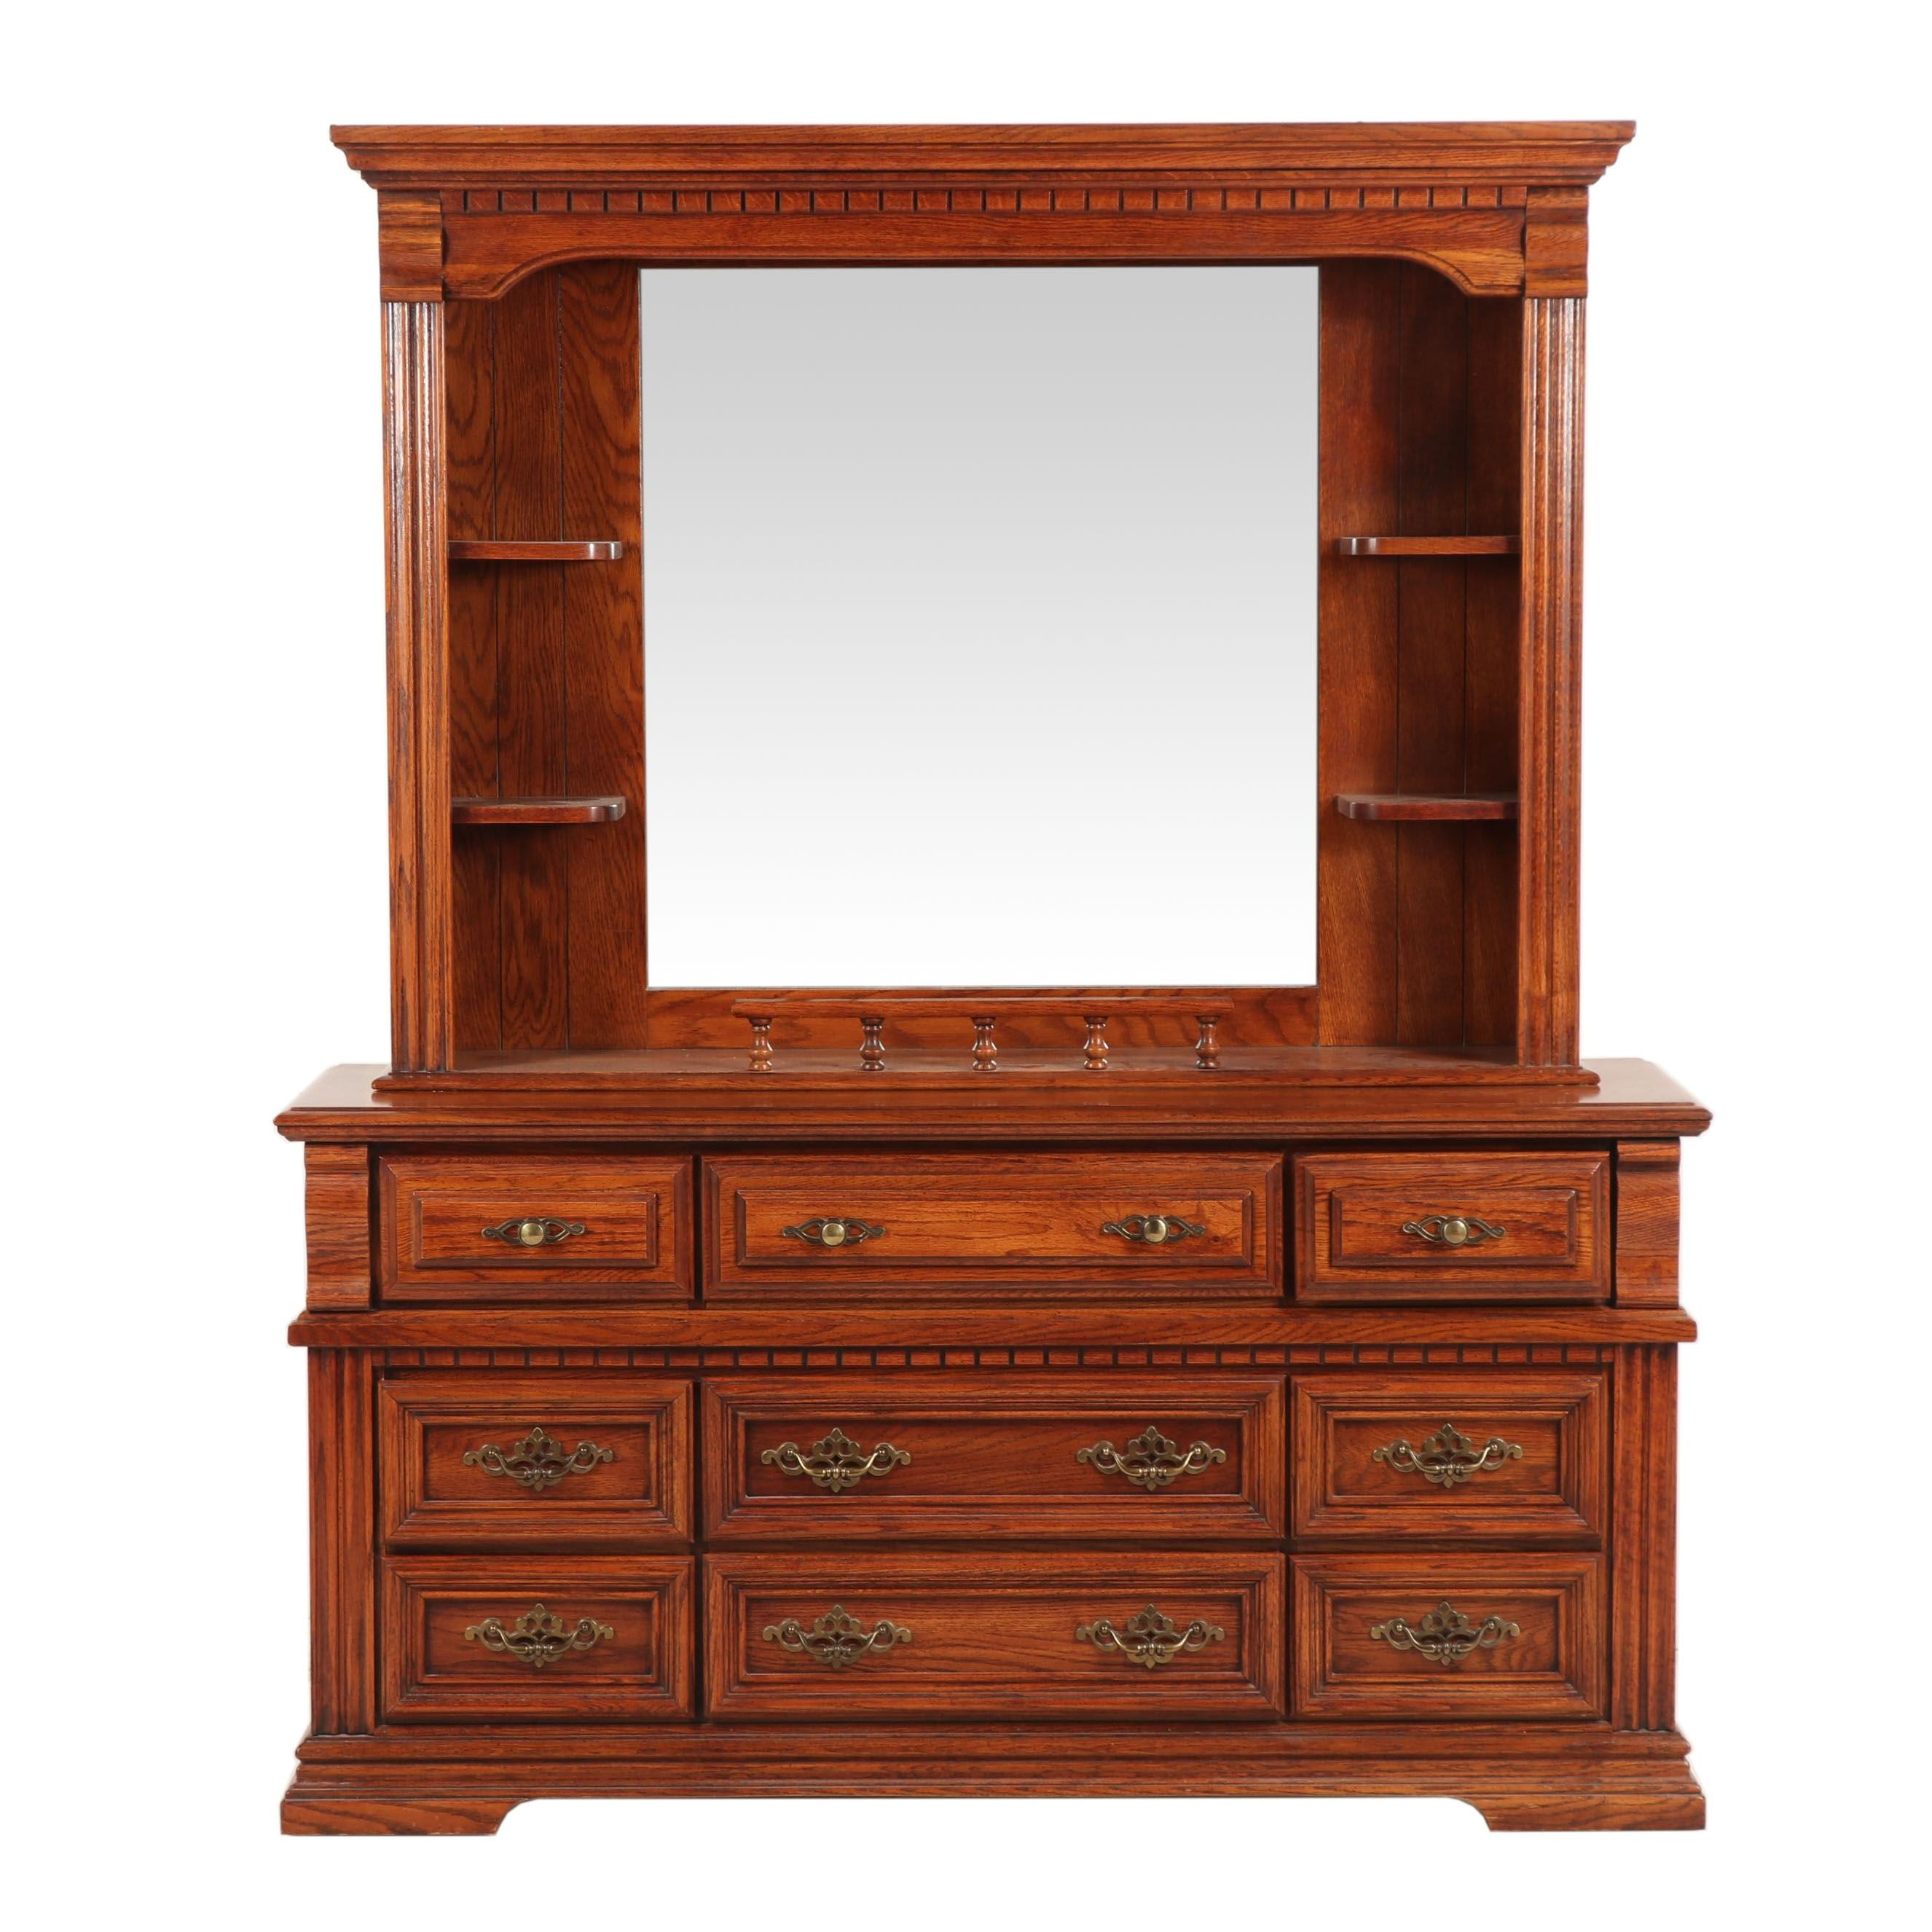 Oak Finish Wooden Dresser with Mirror, 1980s